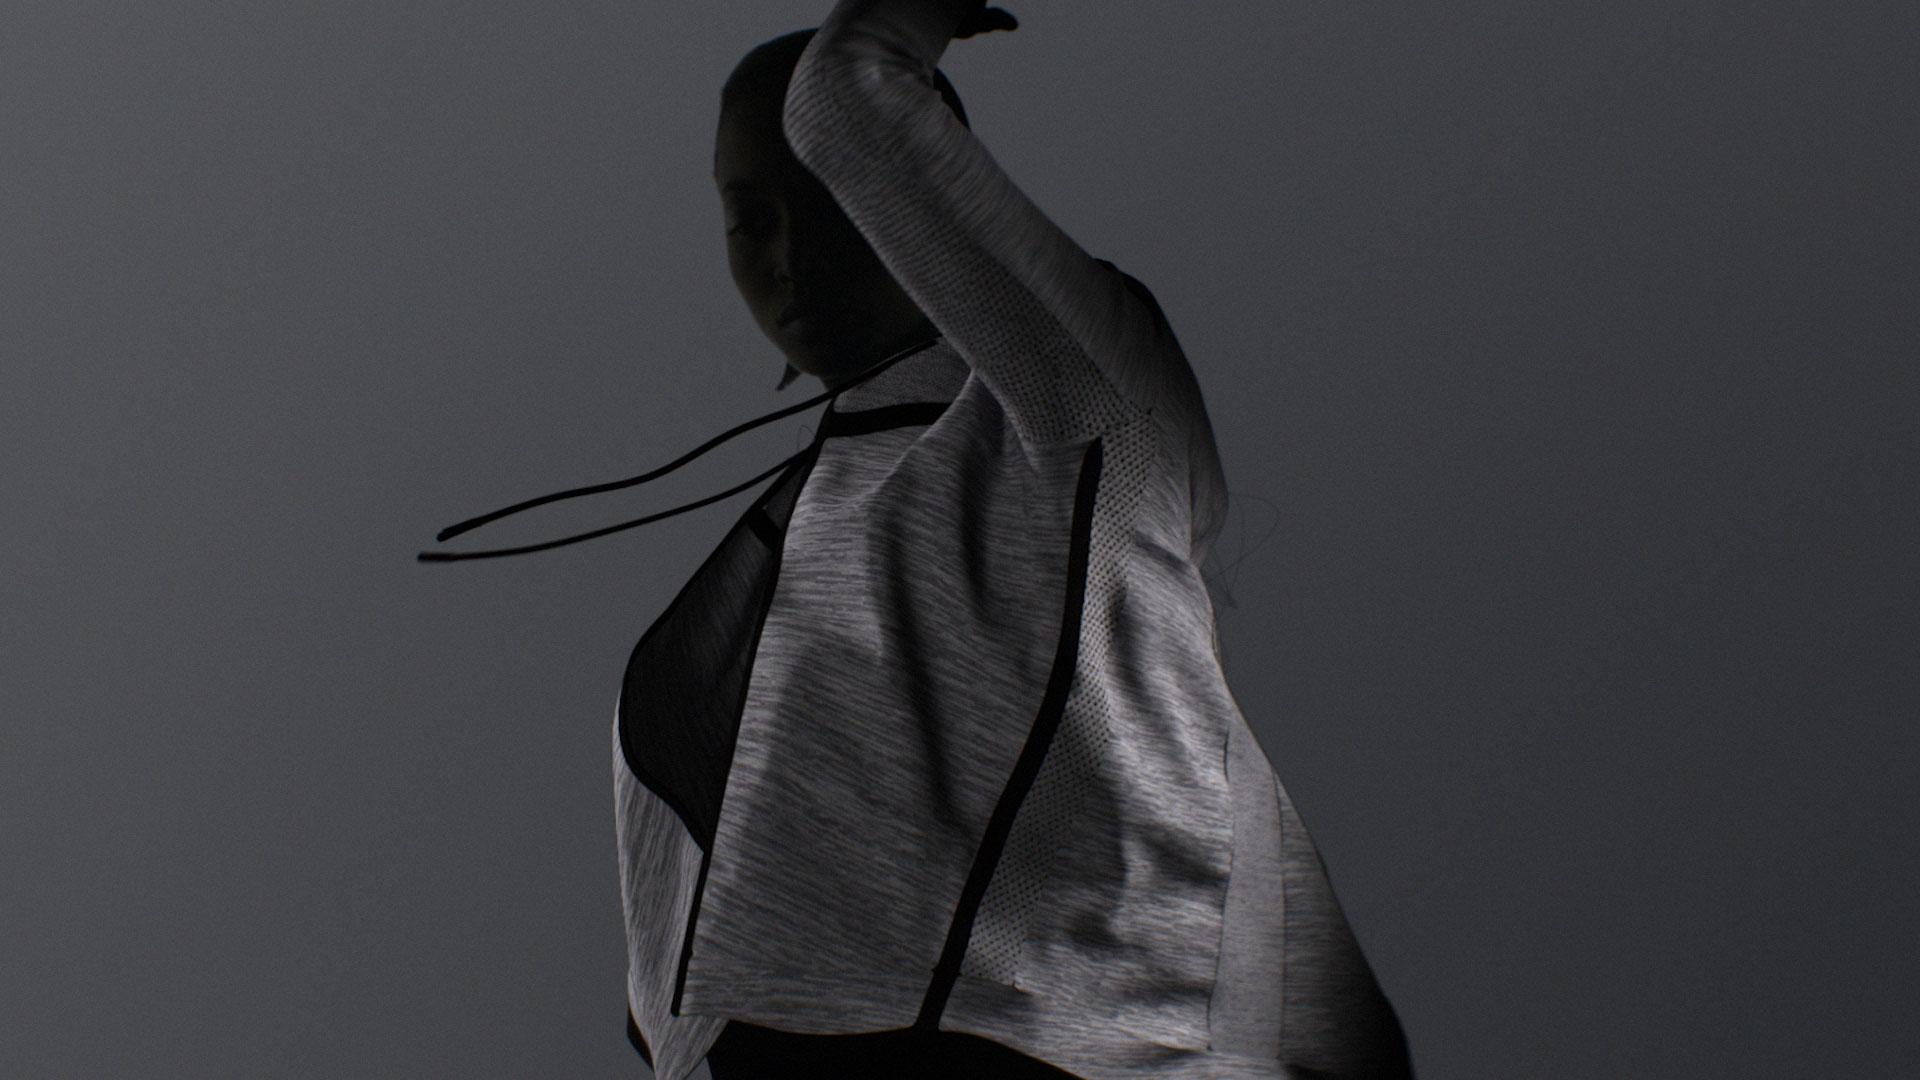 Nike Flyknit sport 3d cgi wind runner woman fabric